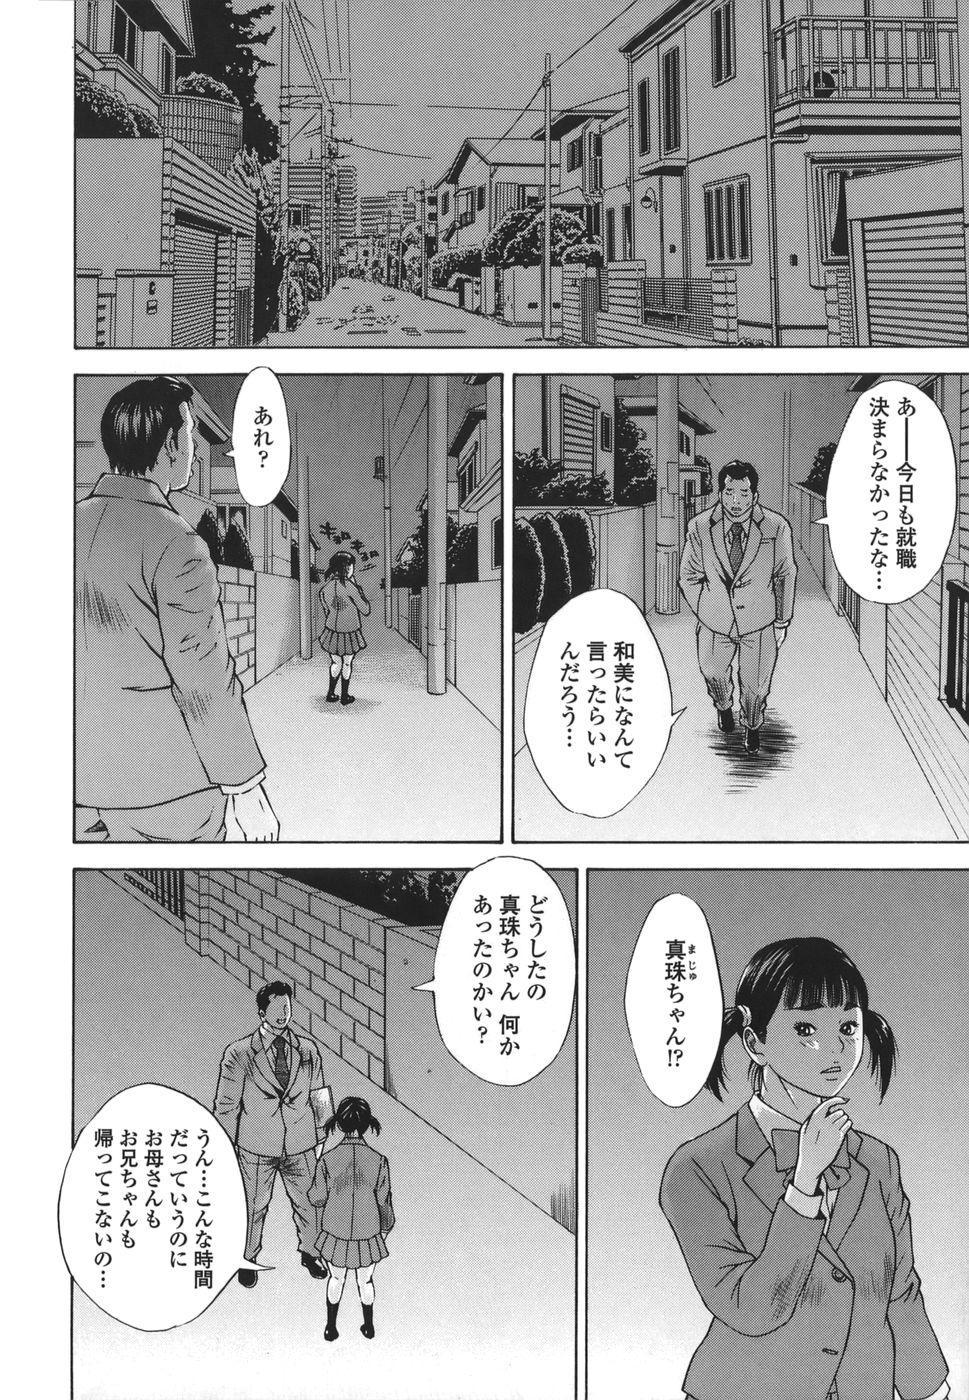 Kinshin Goukan - Near Relation Rapes 115